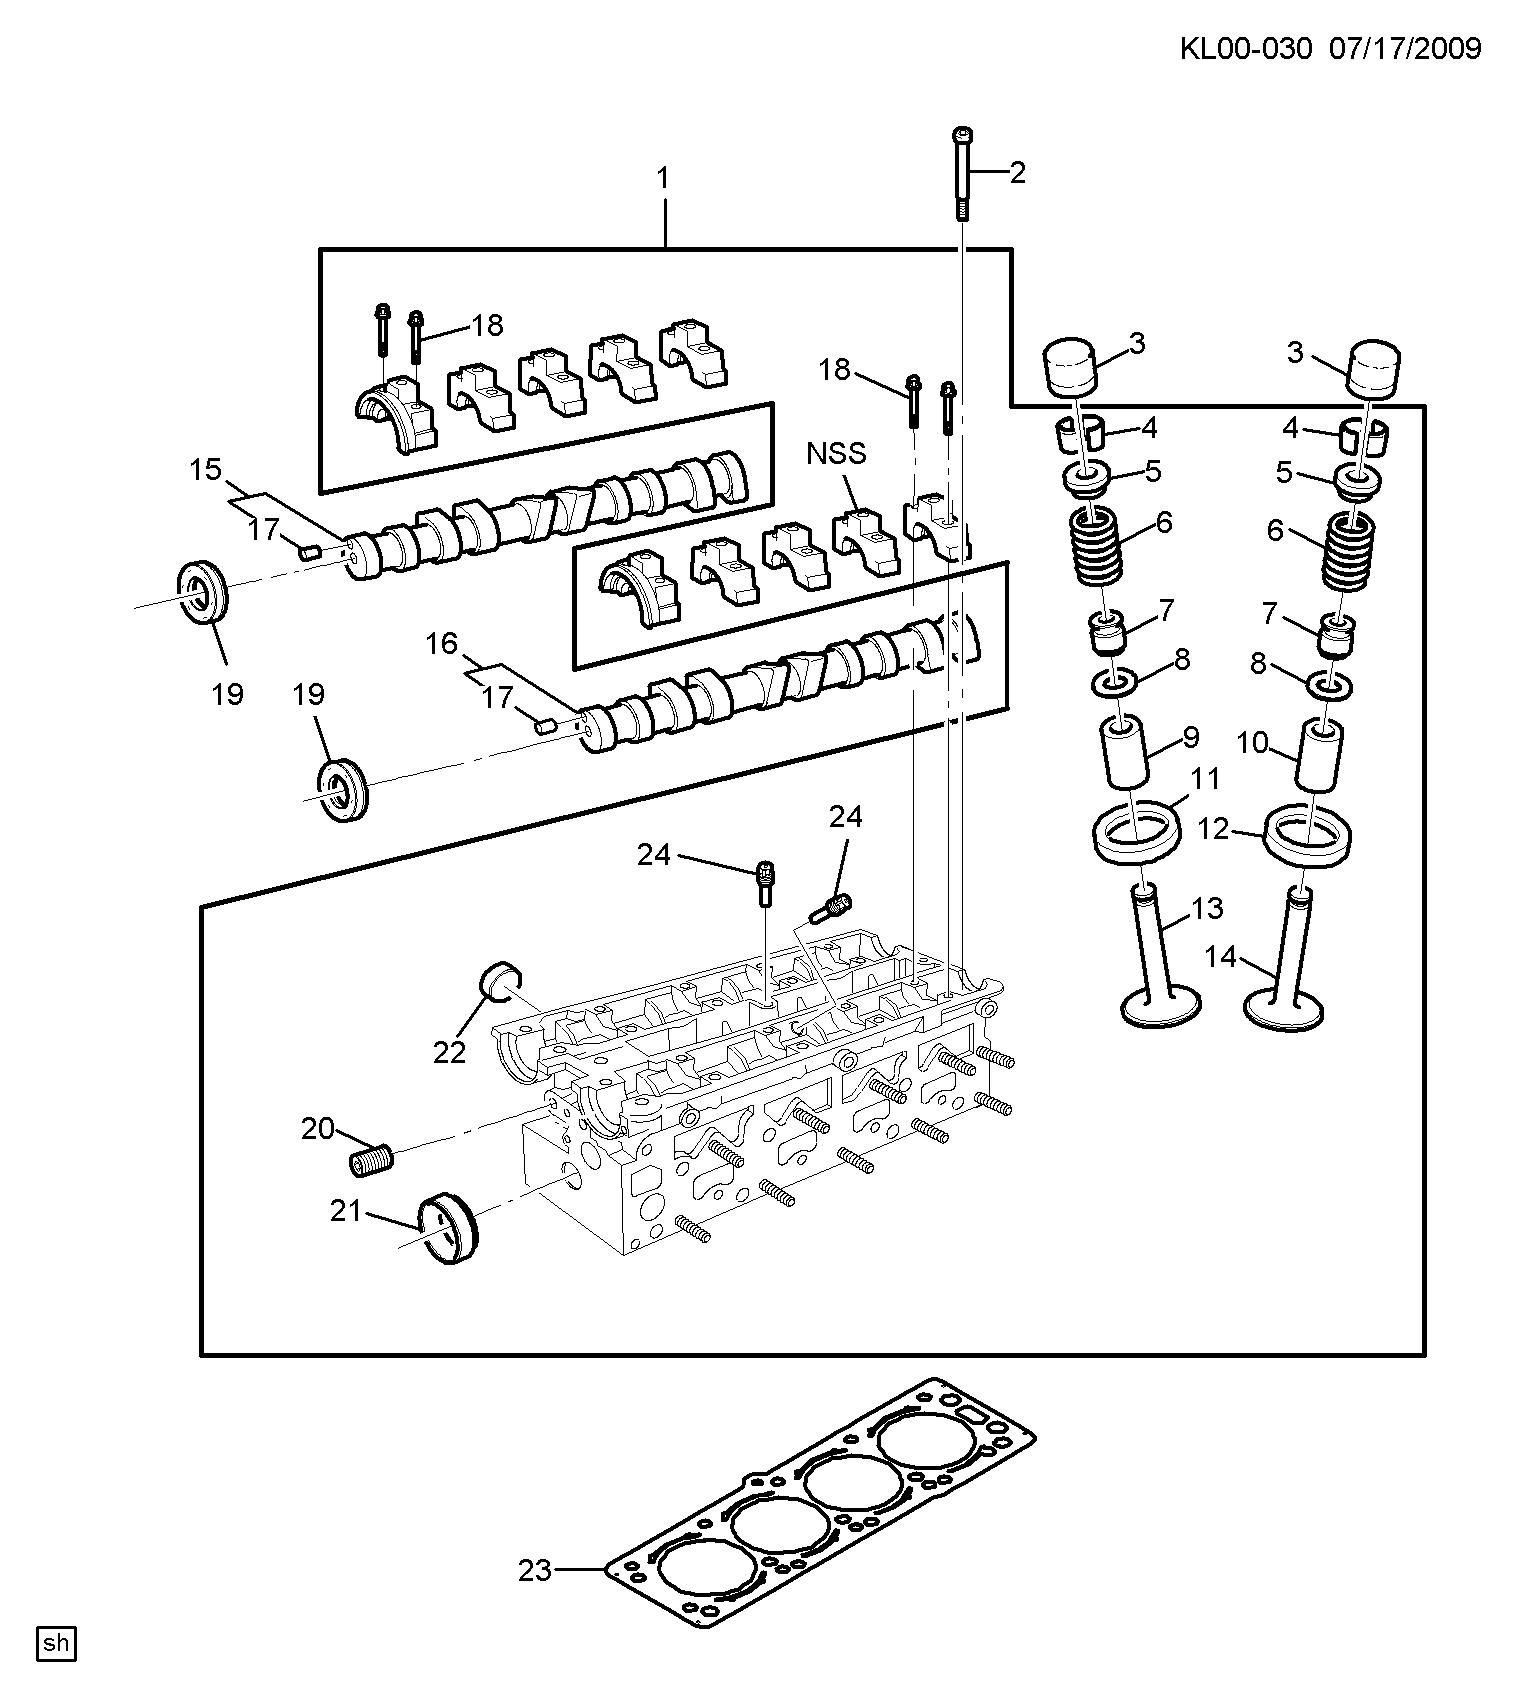 CAPTIVA (C100) - Engine asm-2 4l l4 part 6 cylinder head